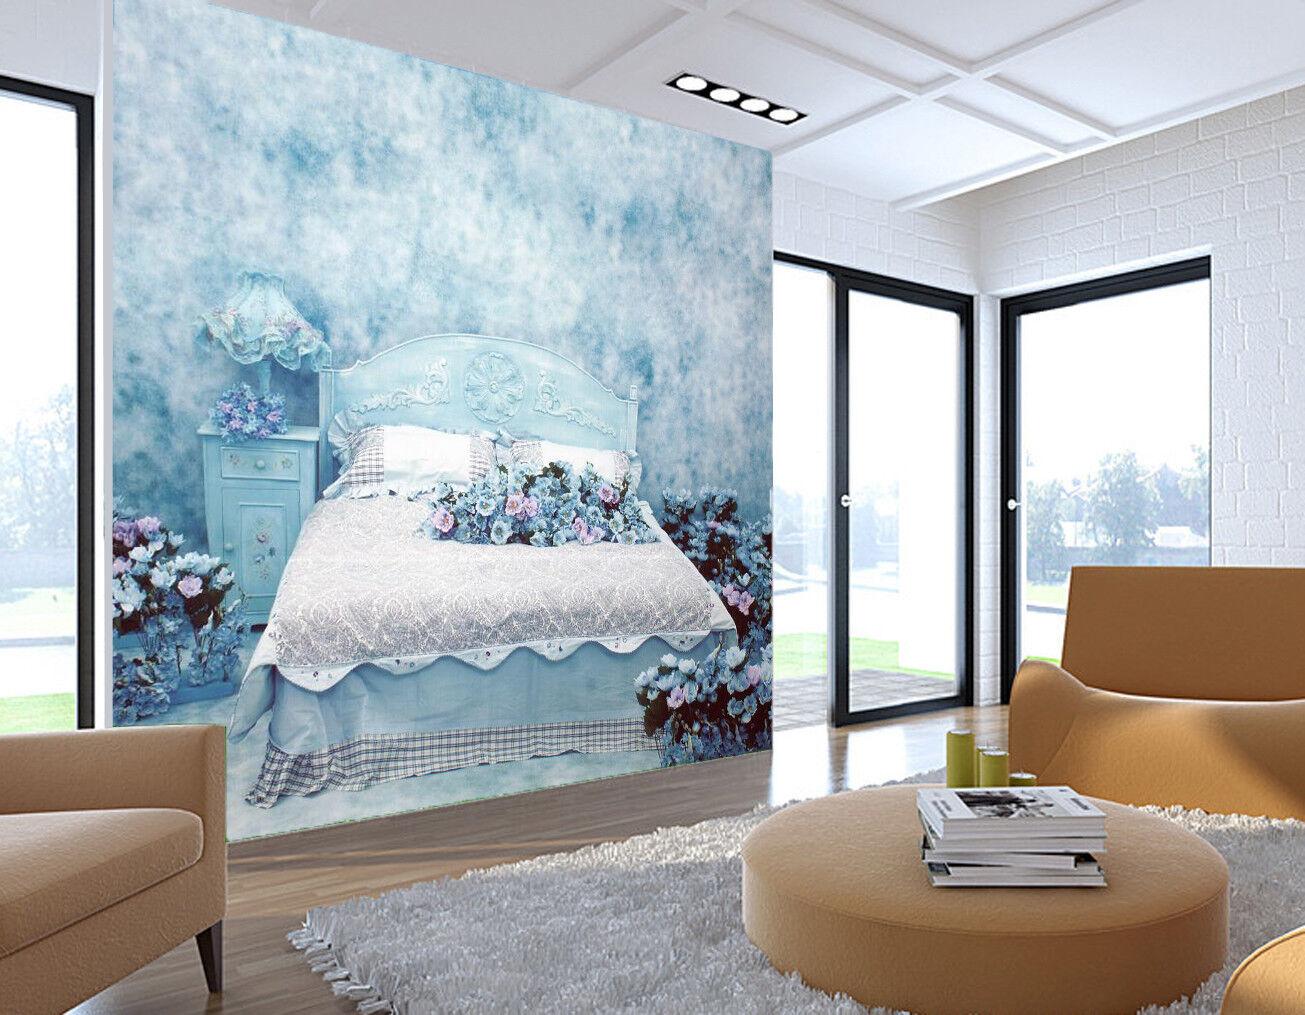 3D Ölgemälde Blaumen Beet 7983 Tapete Wandgemälde Tapeten Bild Familie DE Lemon  | Exquisite Handwerkskunst  | Verschiedene Waren  | Am praktischsten